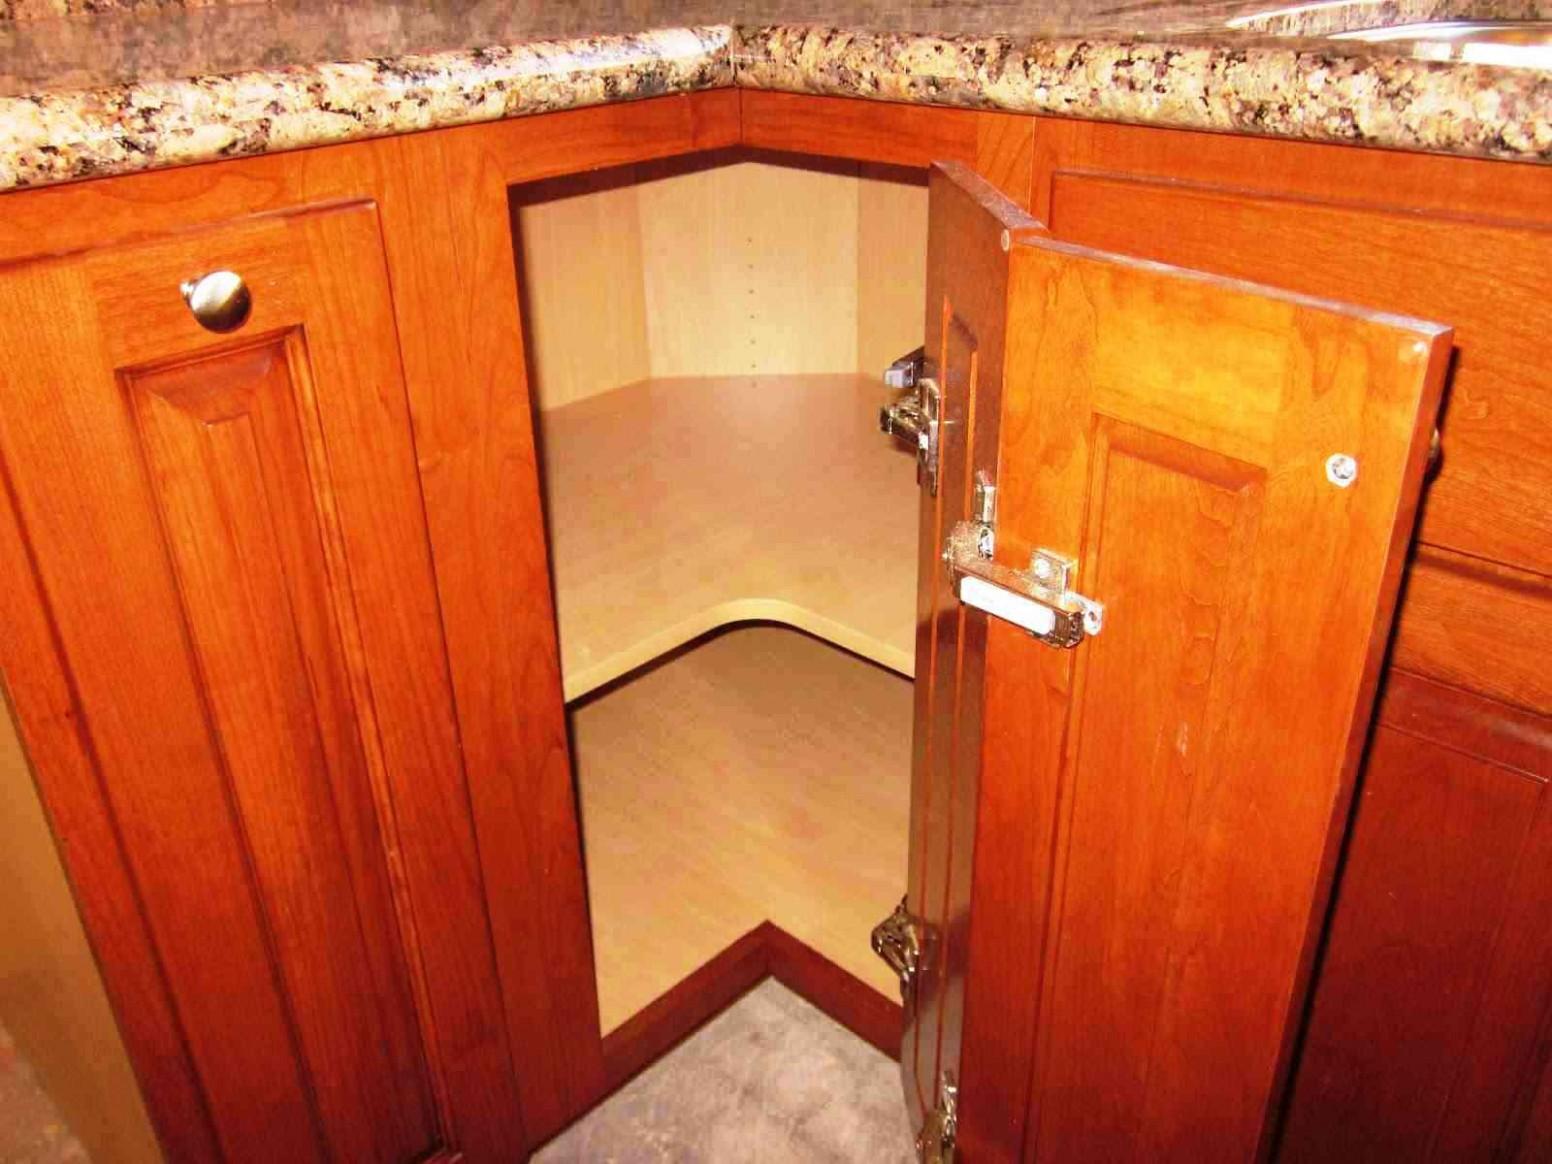 Corner Kitchen Cabinet: Squeeze More Spaces - Home Design & Decor Idea - Corner Hanging Kitchen Cabinet